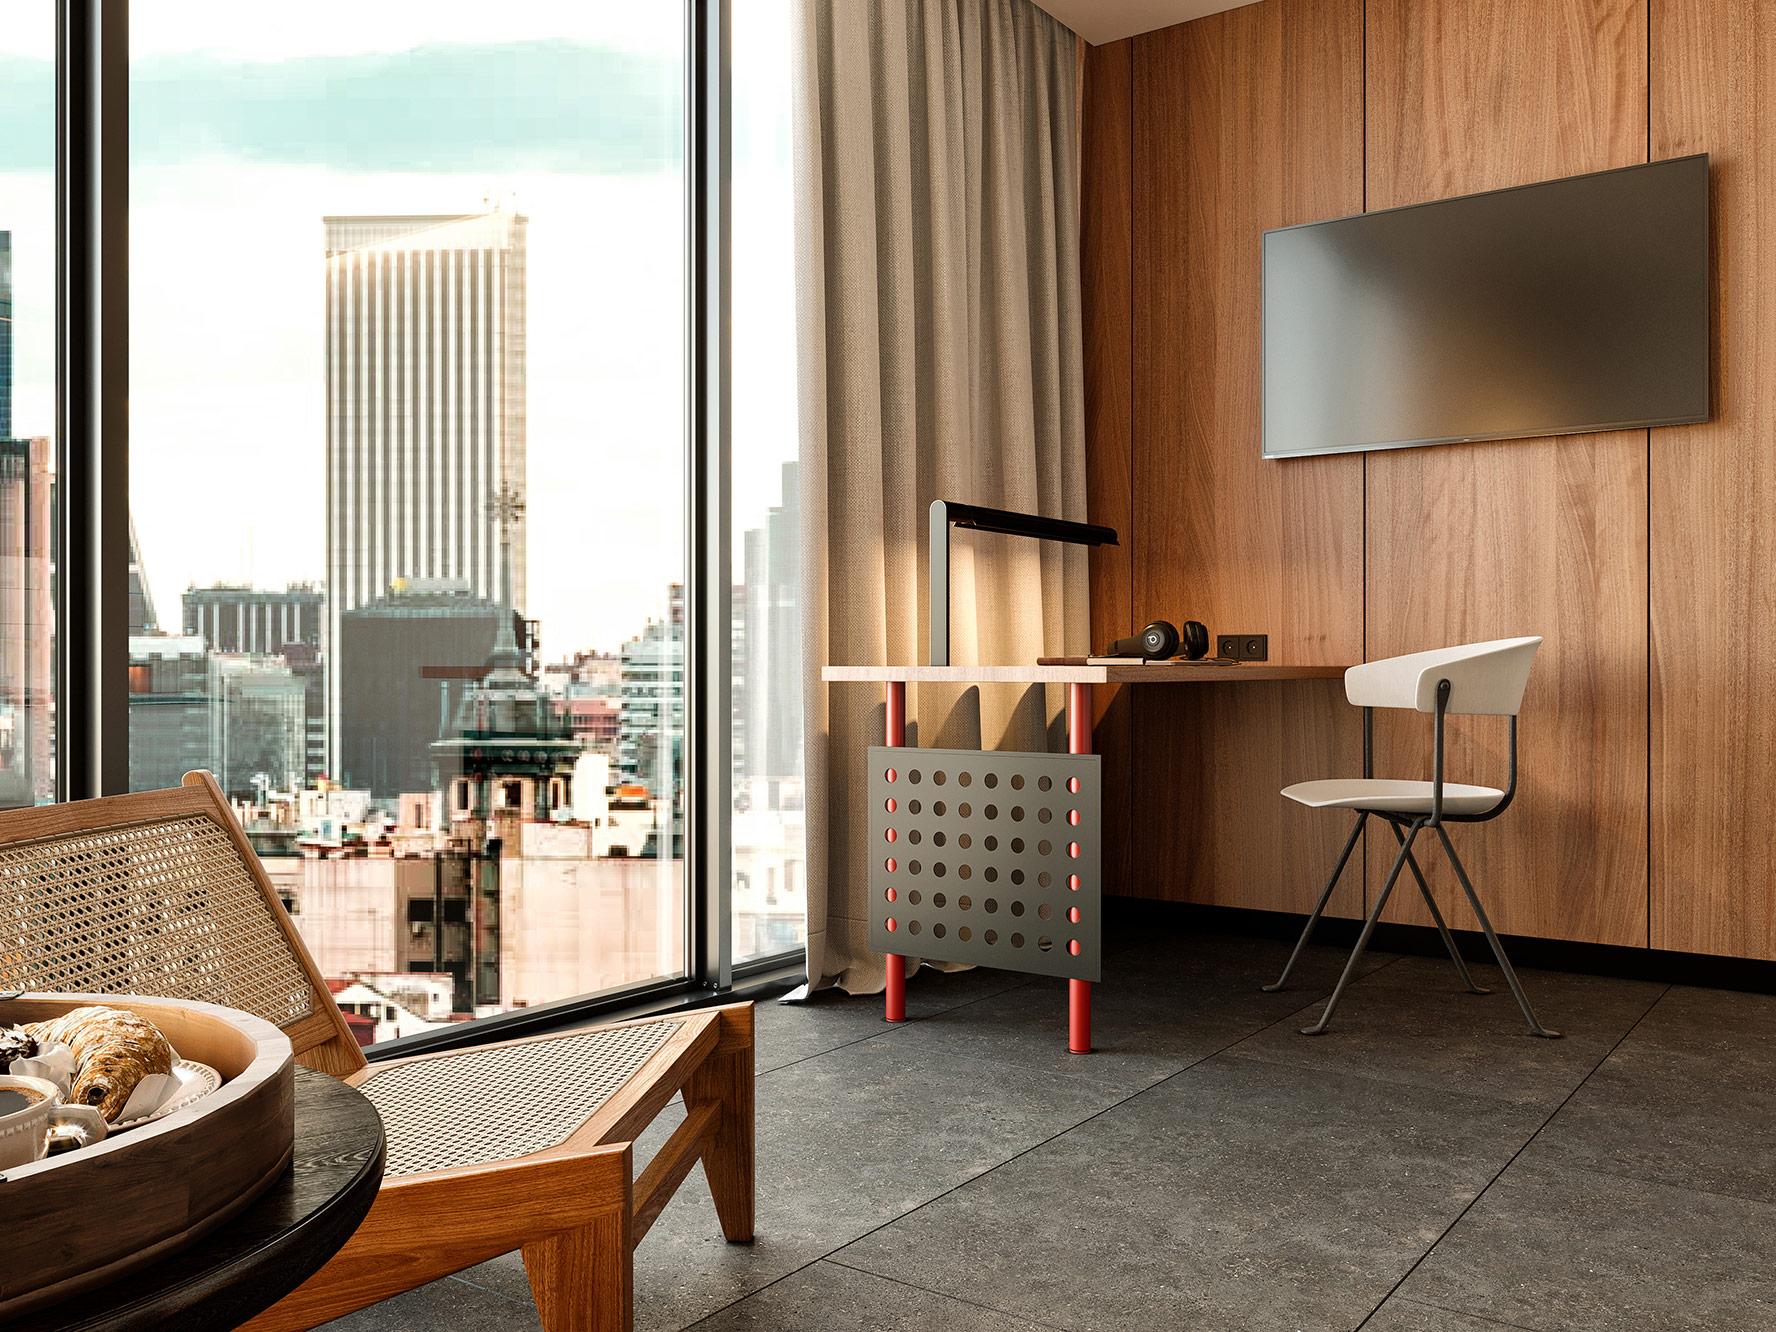 ZAG | Interioristas Hospitality | MOEM Studio